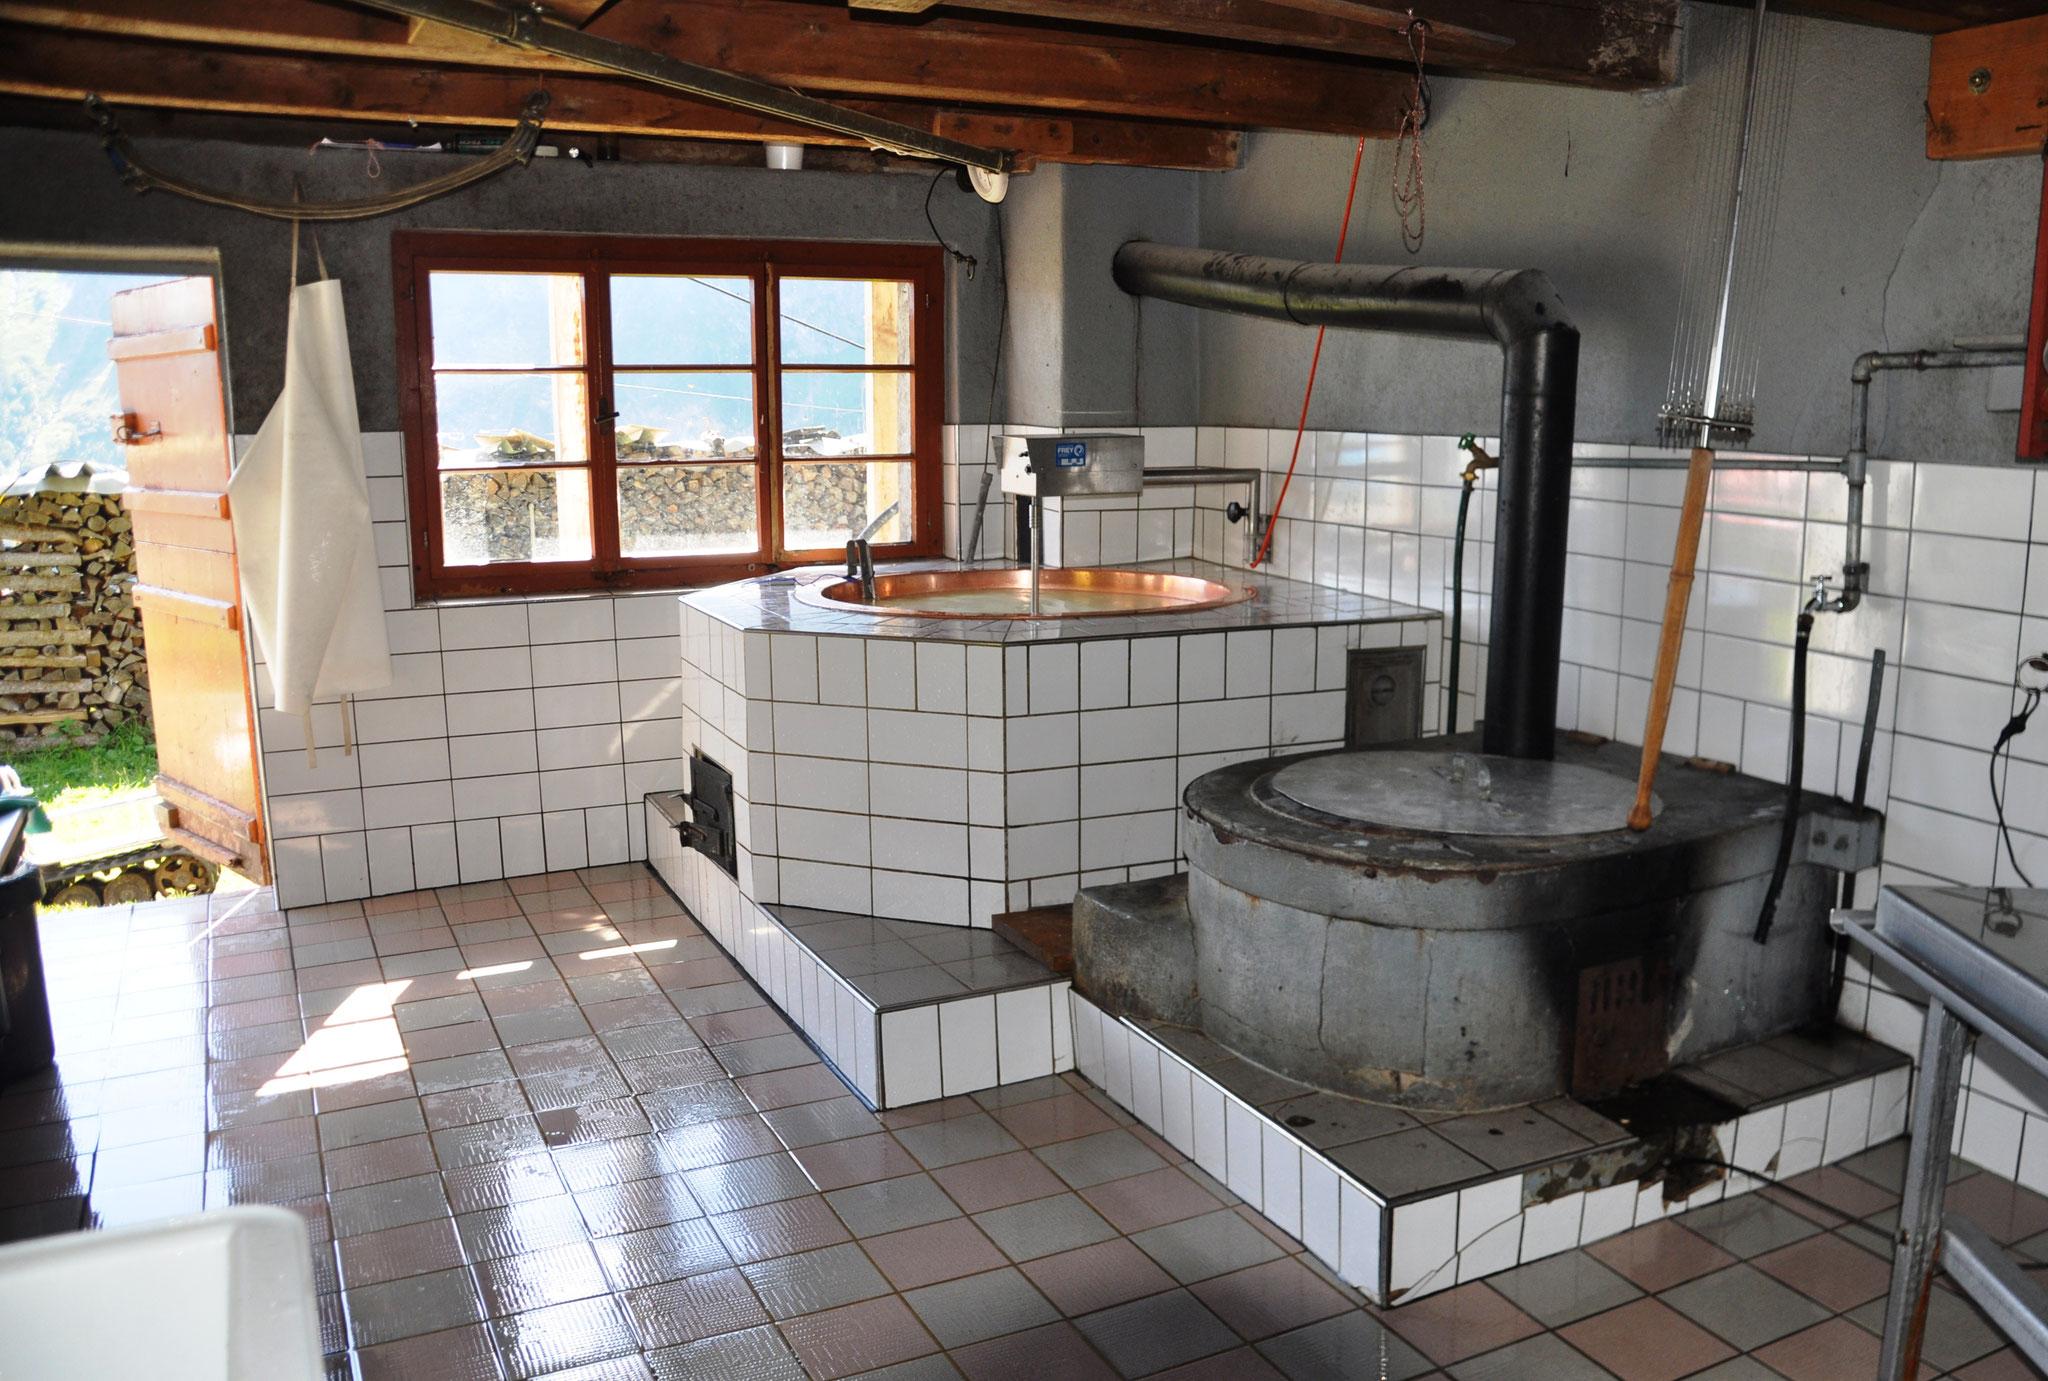 Hier wird unser Musenalpkäse hergestellt. Links das Käse-, rechts das Heisswasserkessi.